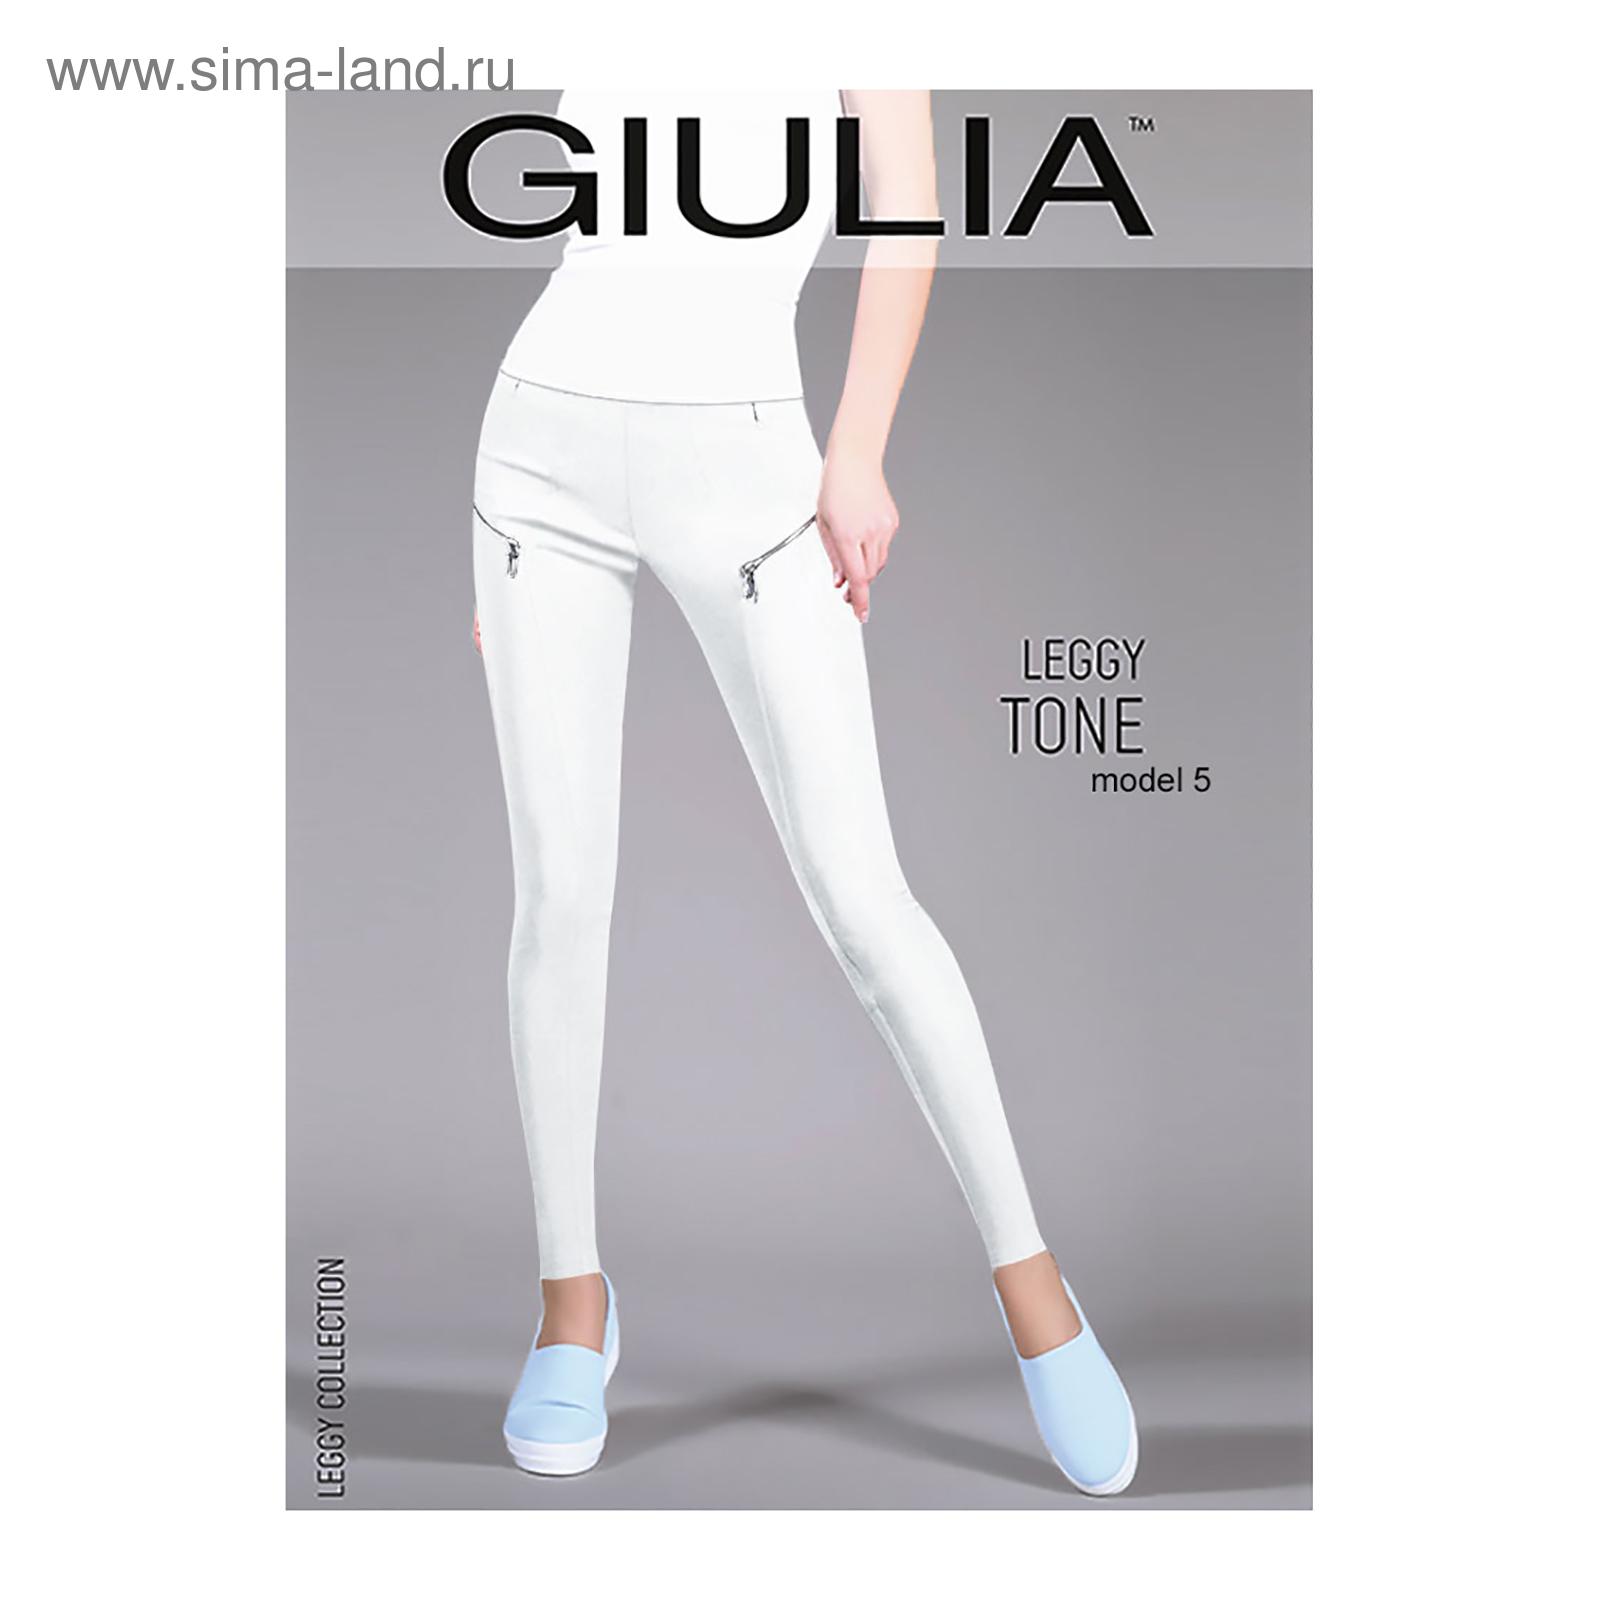 4a1191a04c3a2 Леггинсы женские LEGGY TONE 05, цвет white, размер M (618696 ...